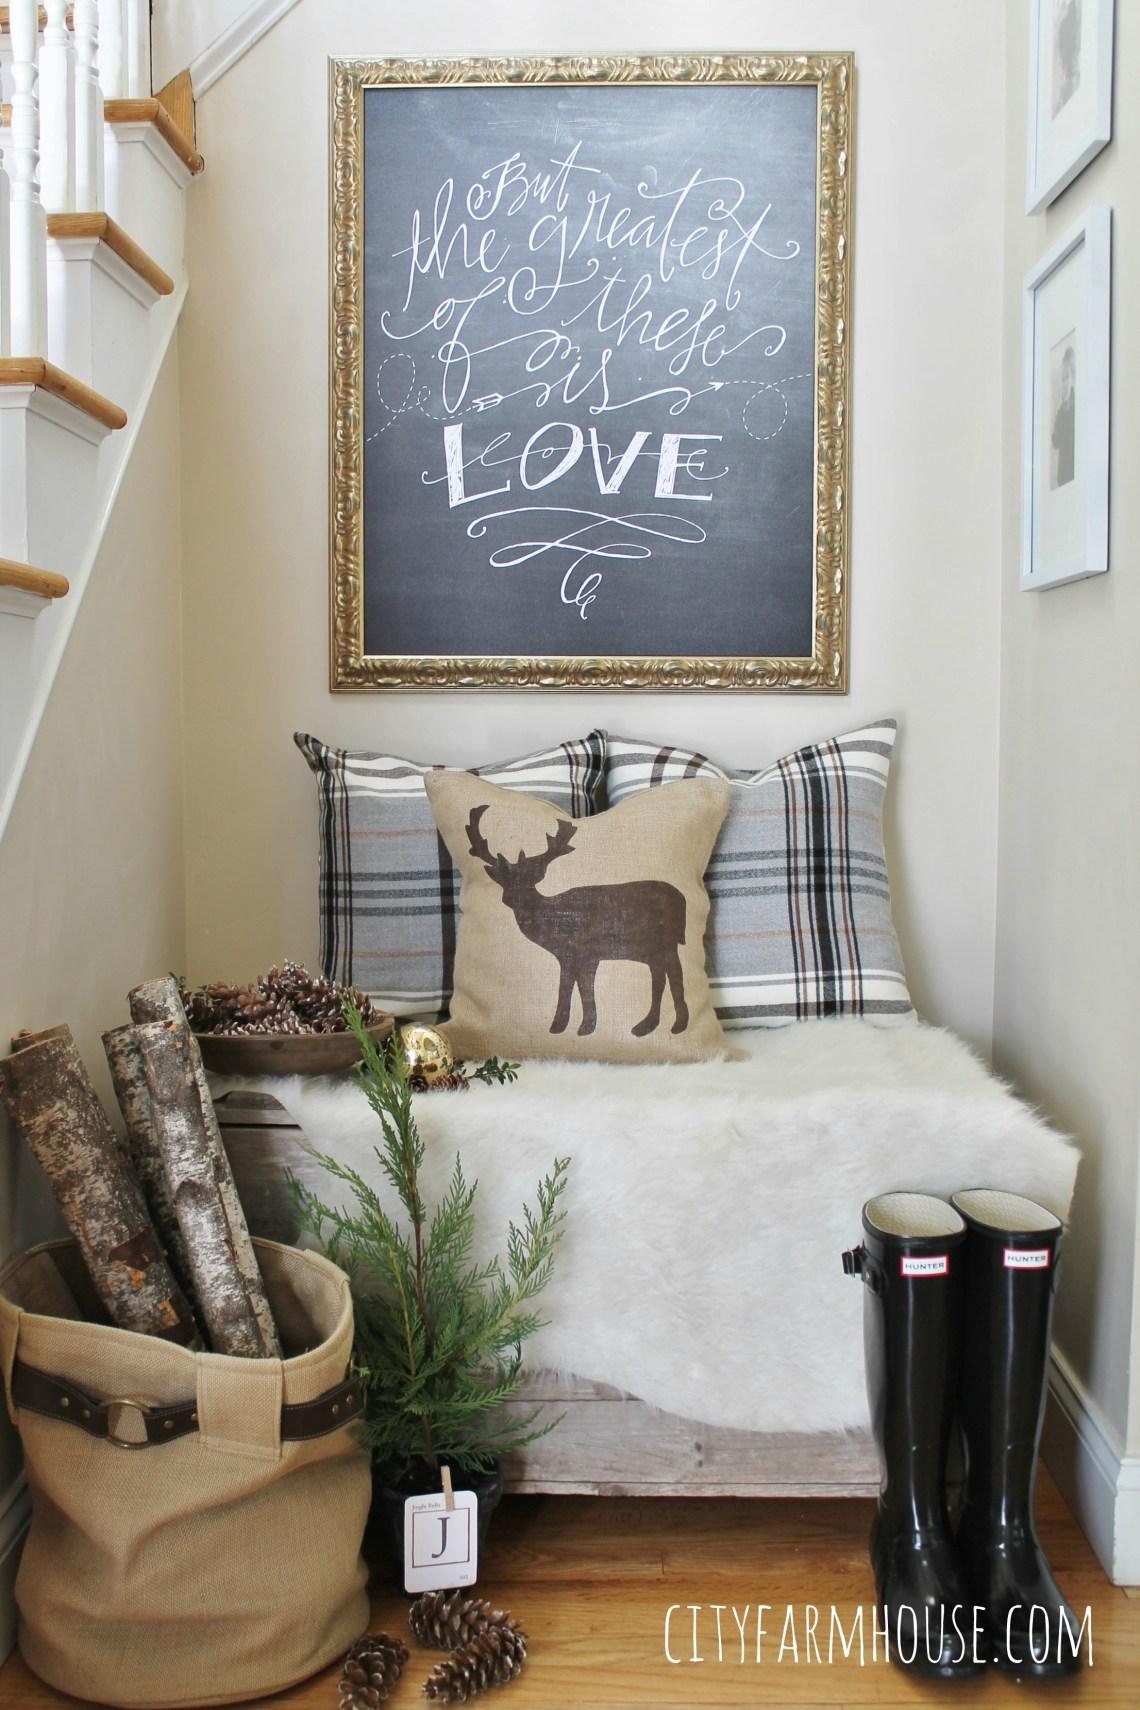 Farmhouse Home Decor Ideas | The 36th AVENUE